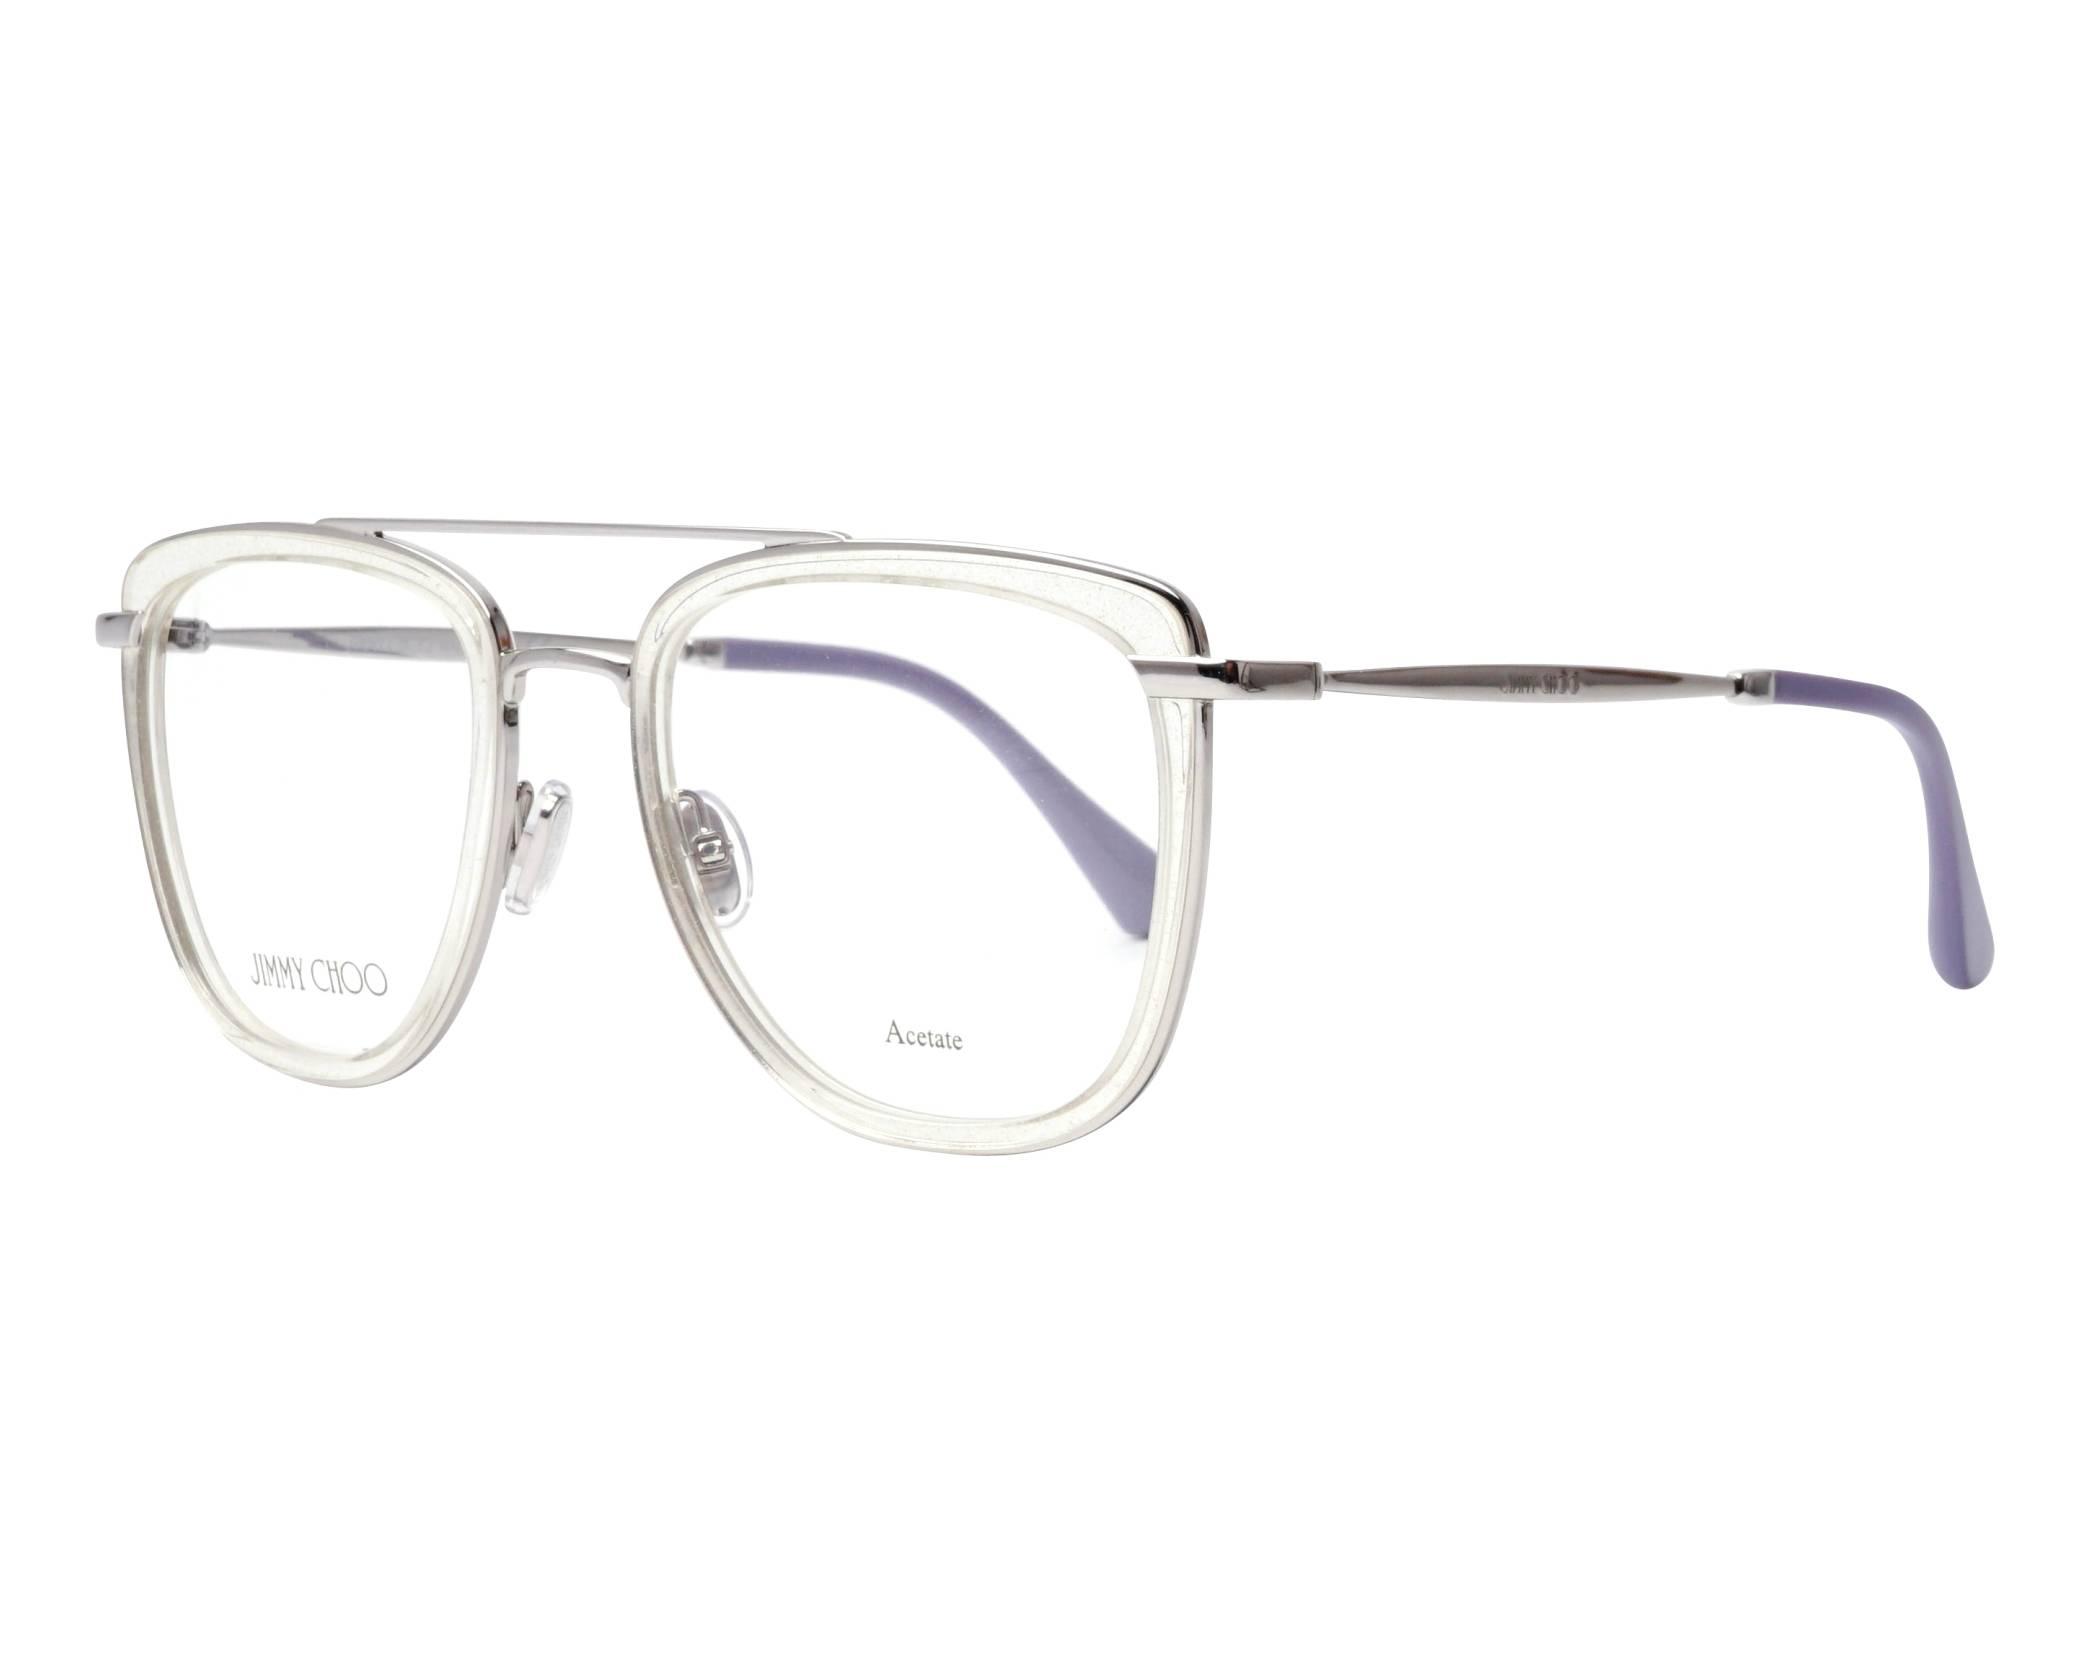 60869a7e55b4 eyeglasses Jimmy Choo JC-219 900 52-20 Crystal Silver profile view